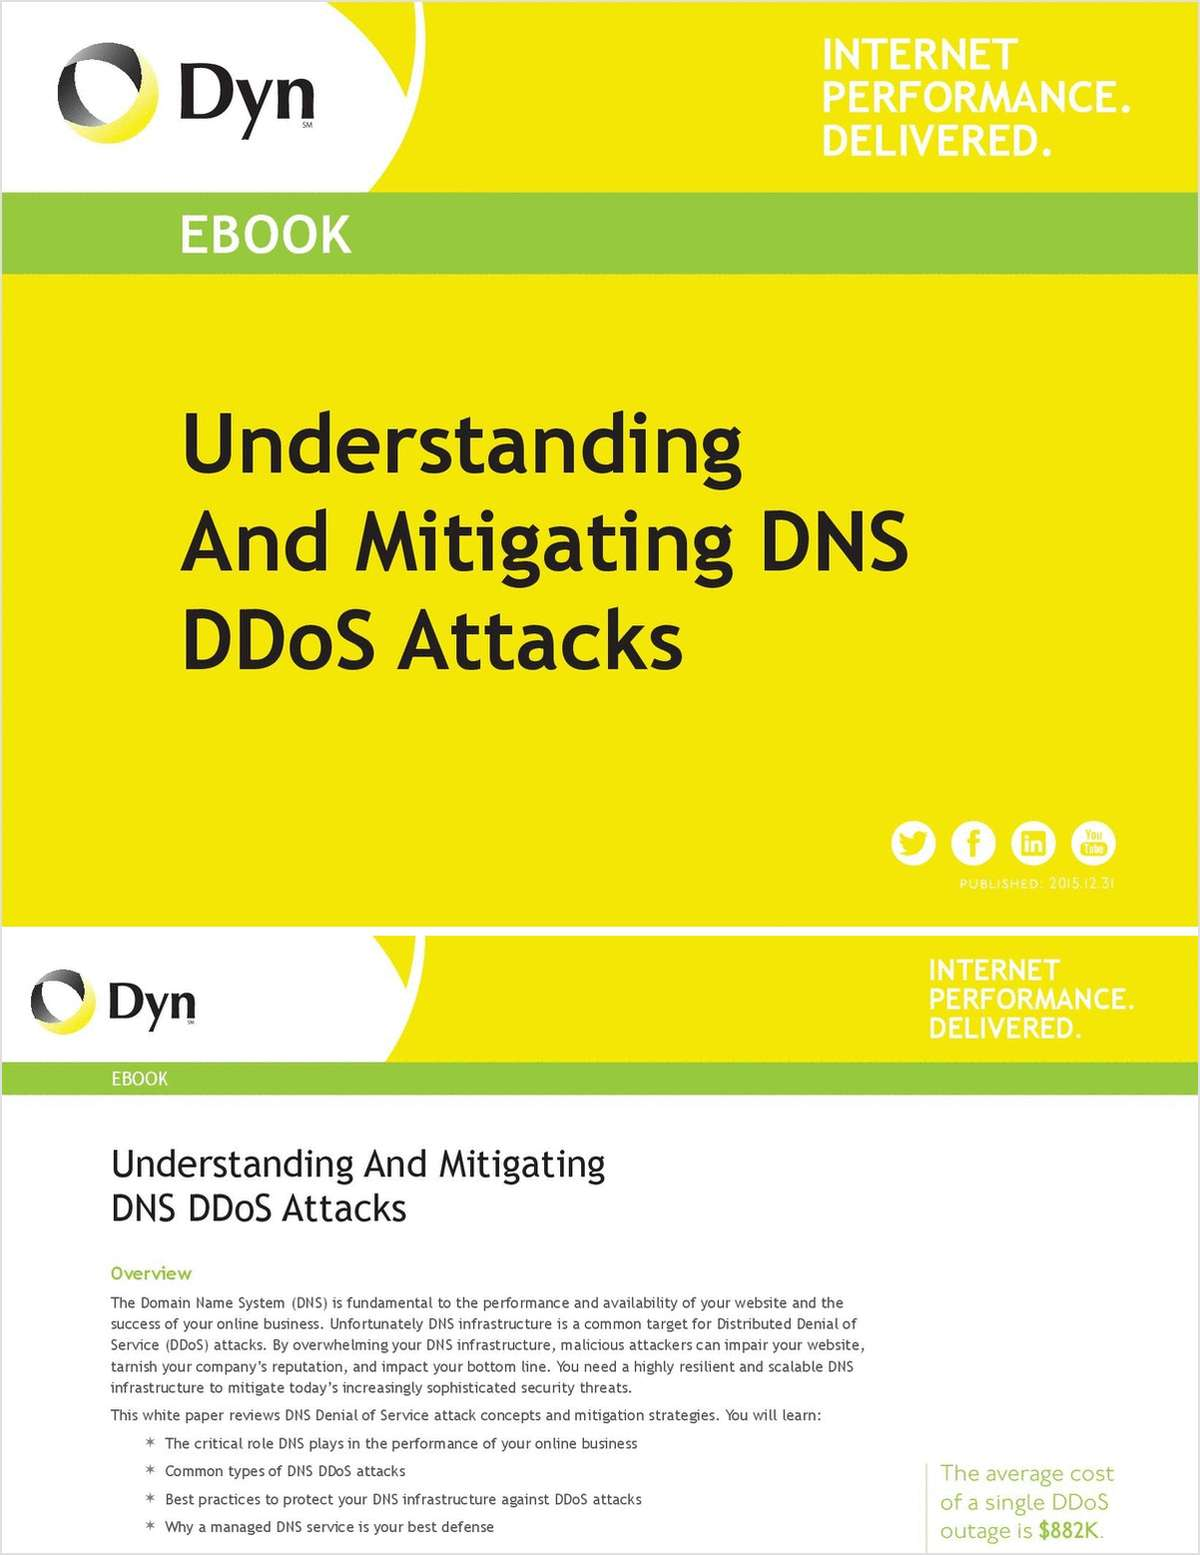 Understanding And Mitigating DNS DDoS Attacks